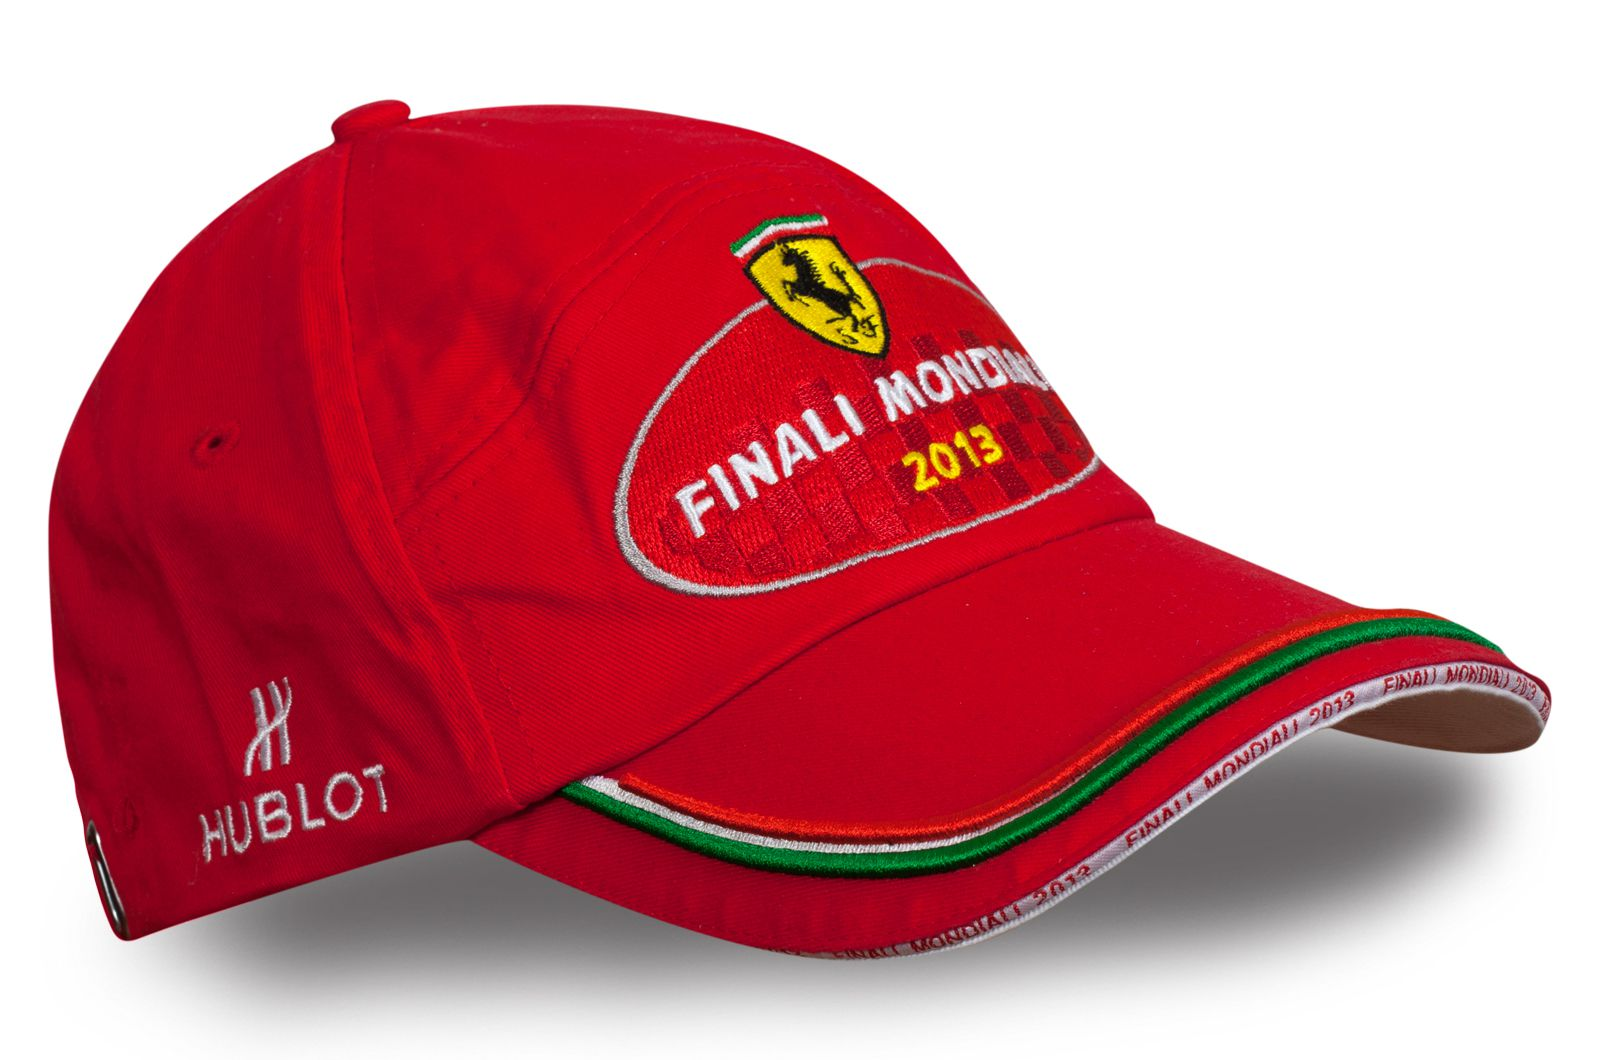 Брендовая бейсболка Finali Mondiali Ferrari